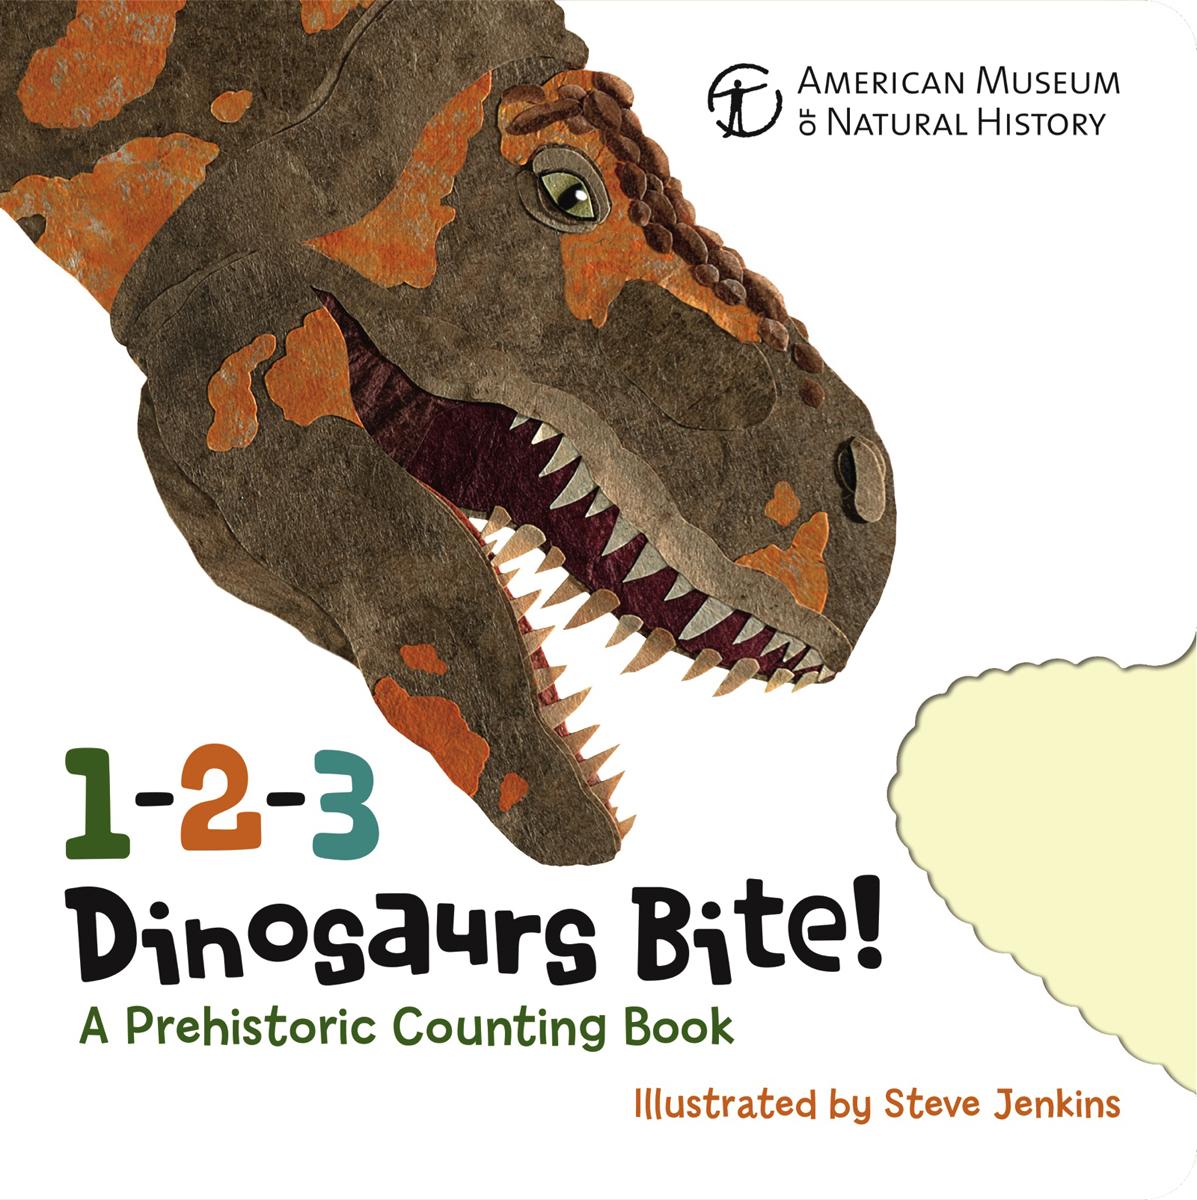 1-2-3 Dinosaurs Bite